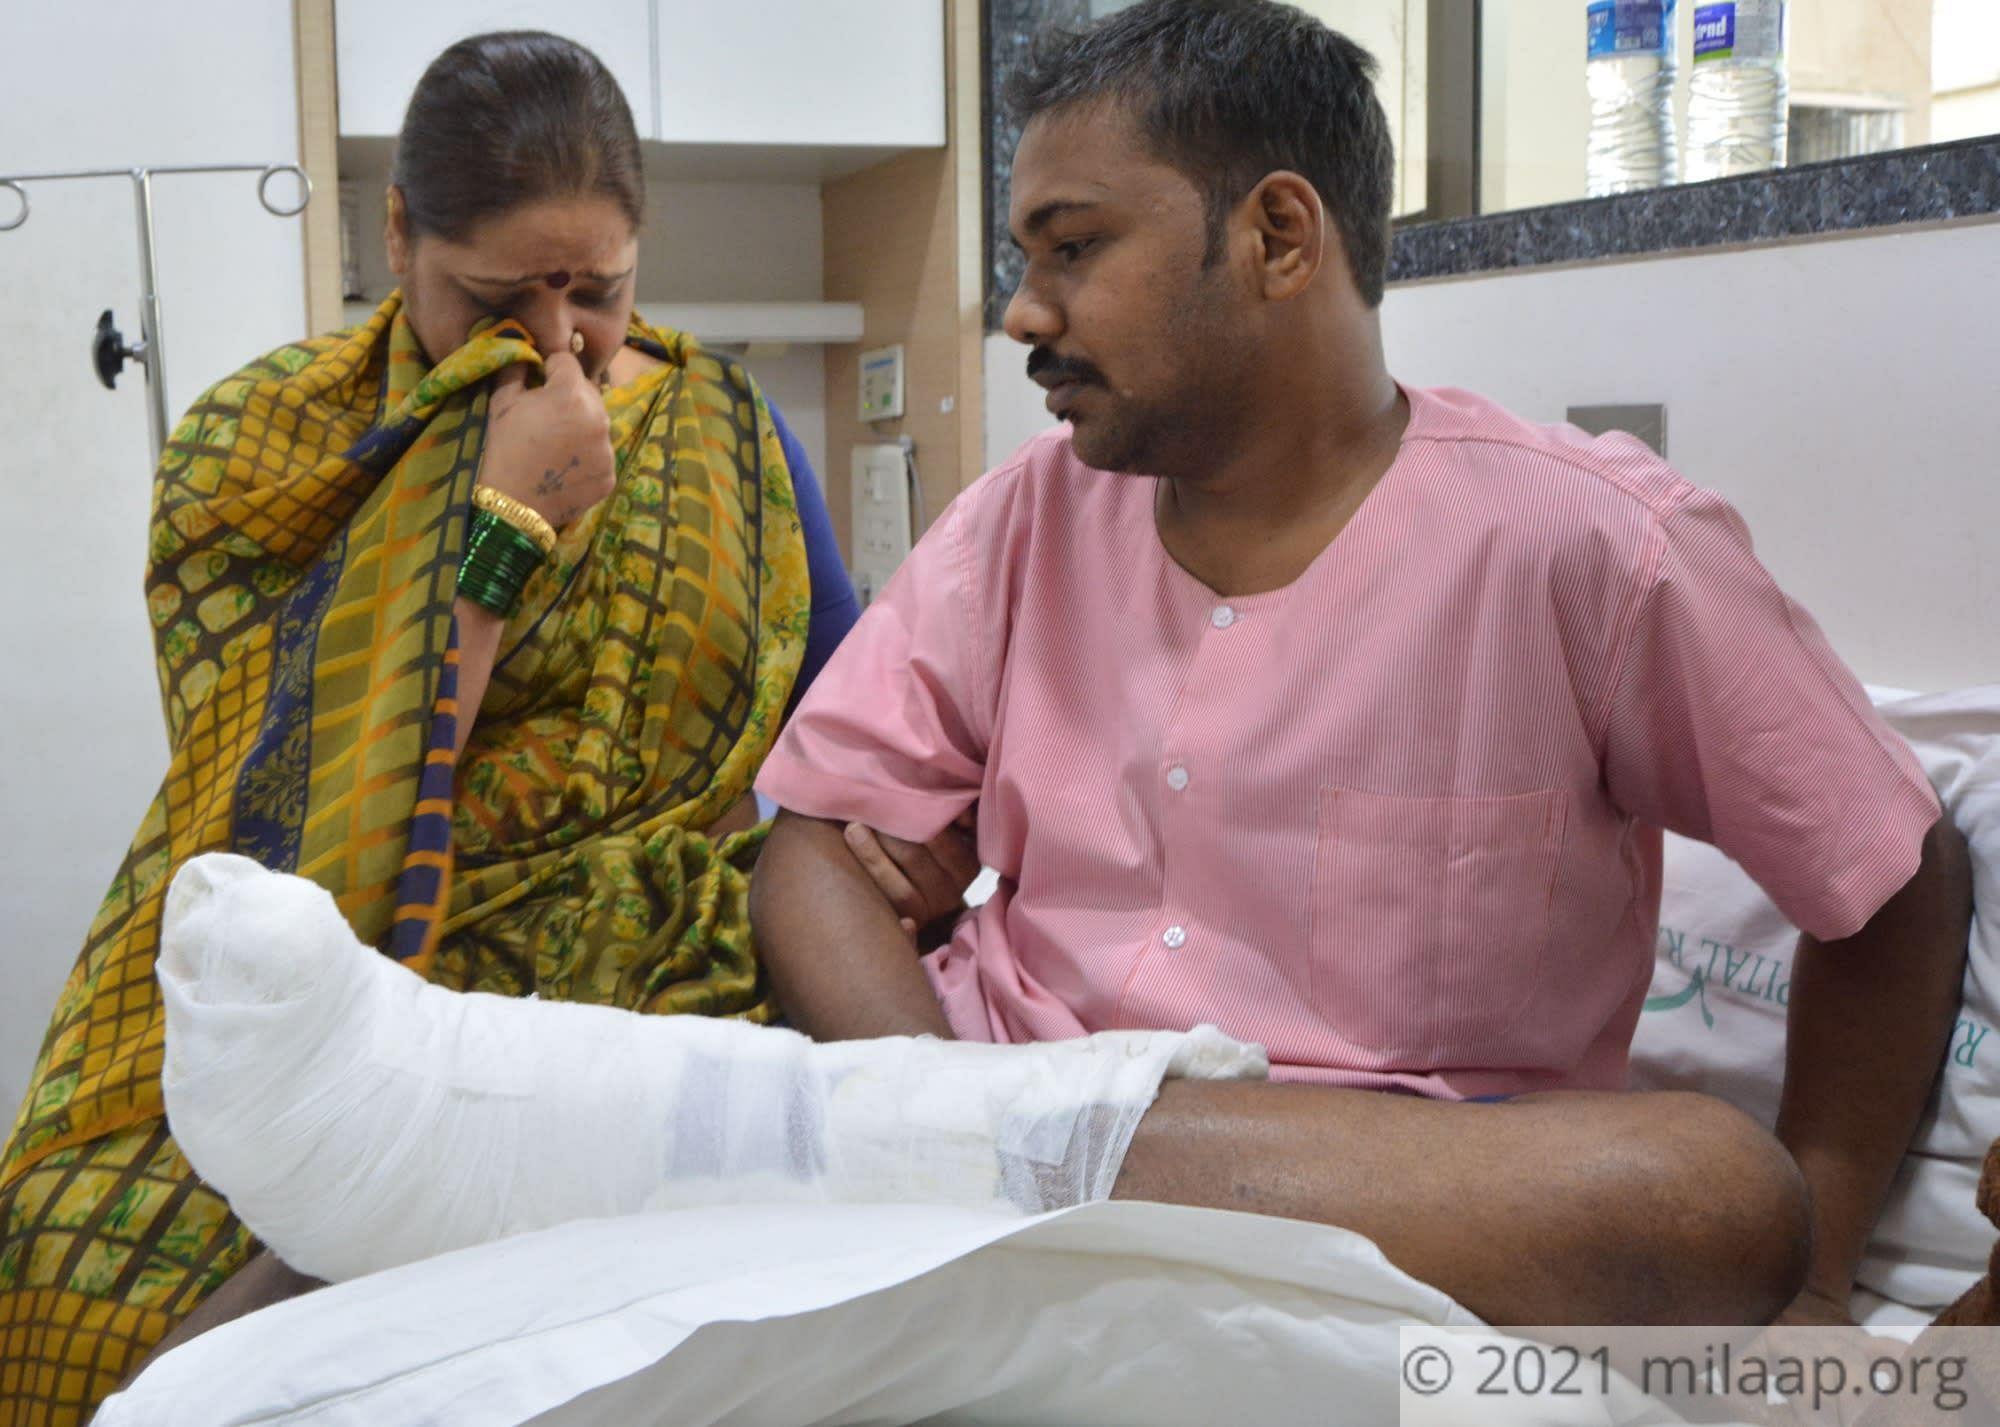 Rohit raj hospital 25 tz8mjg 1583737621